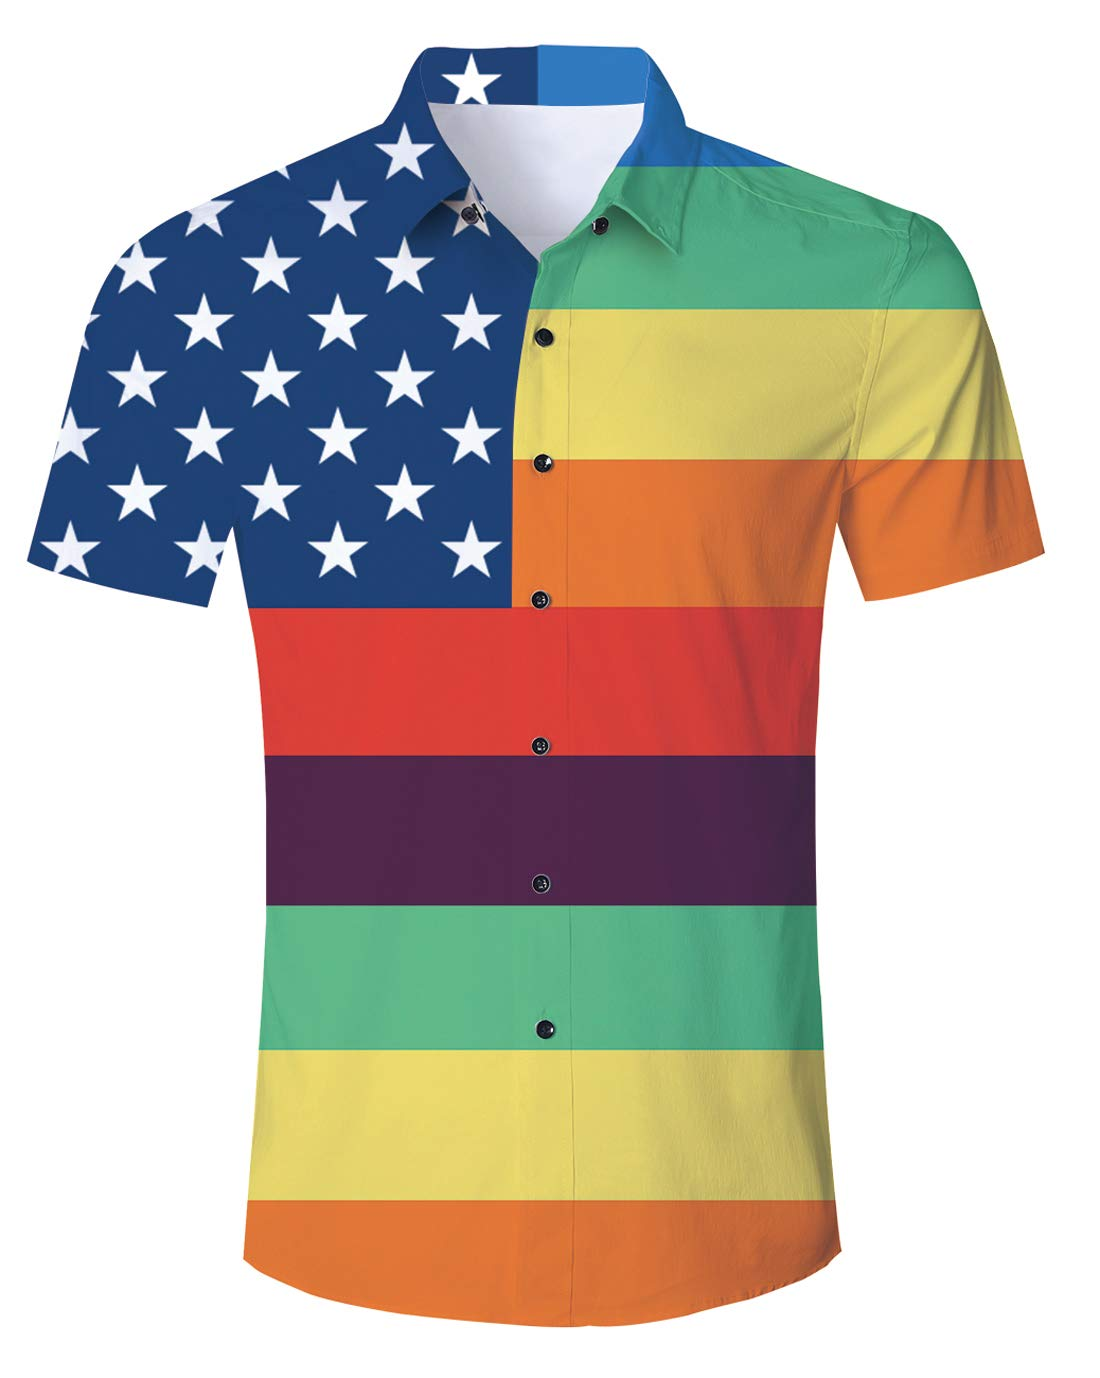 American Rainbow Colors Flag Short Sleeve Shirt for Men Summer Casual Beach Shirts